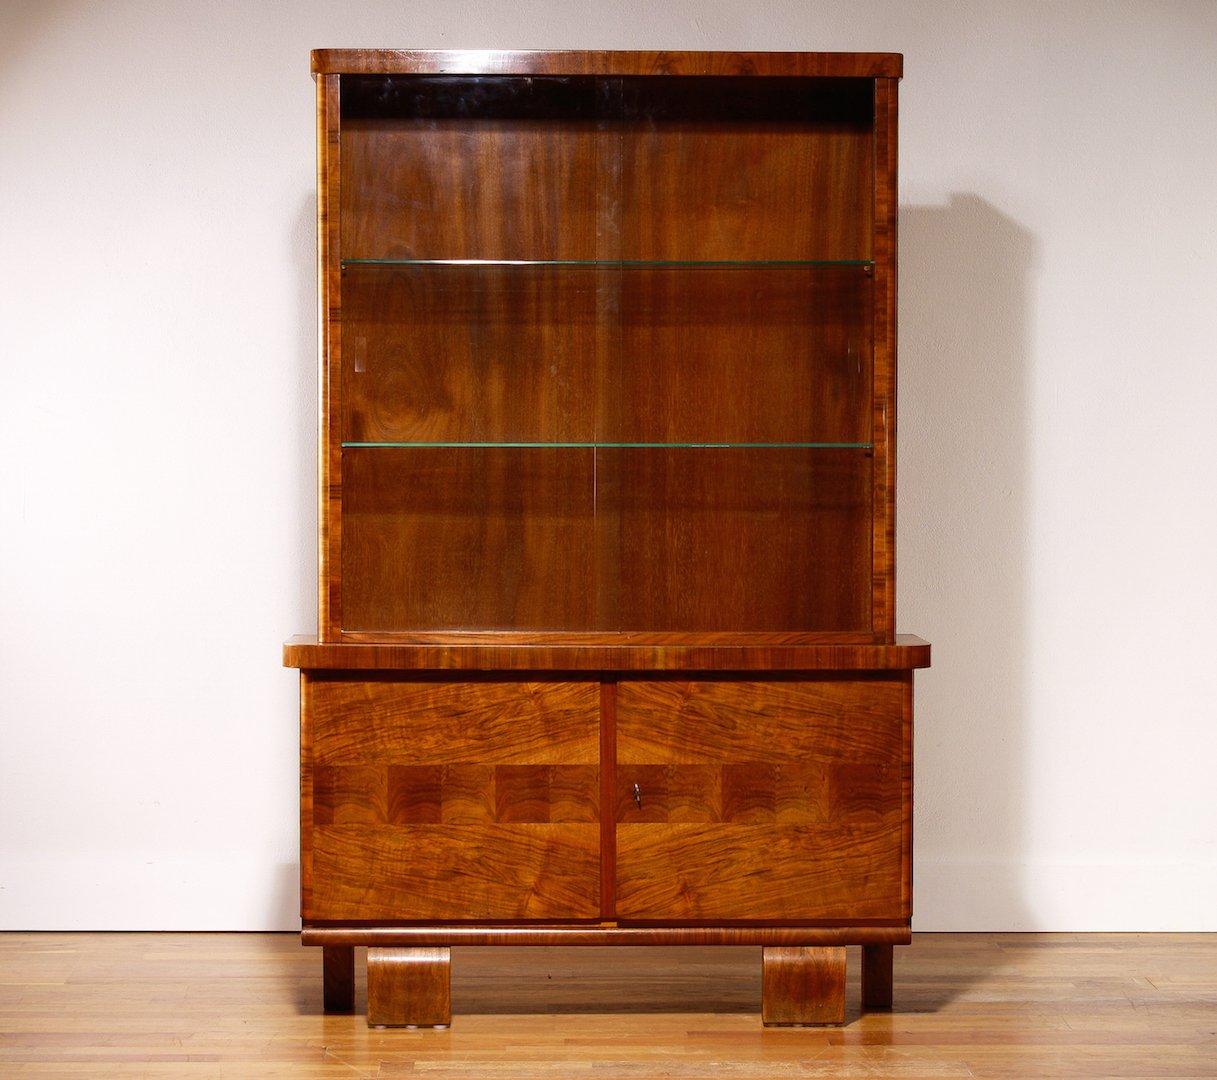 Vintage Art Deco Walnut Veneer Display Cabinet for sale at Pamono